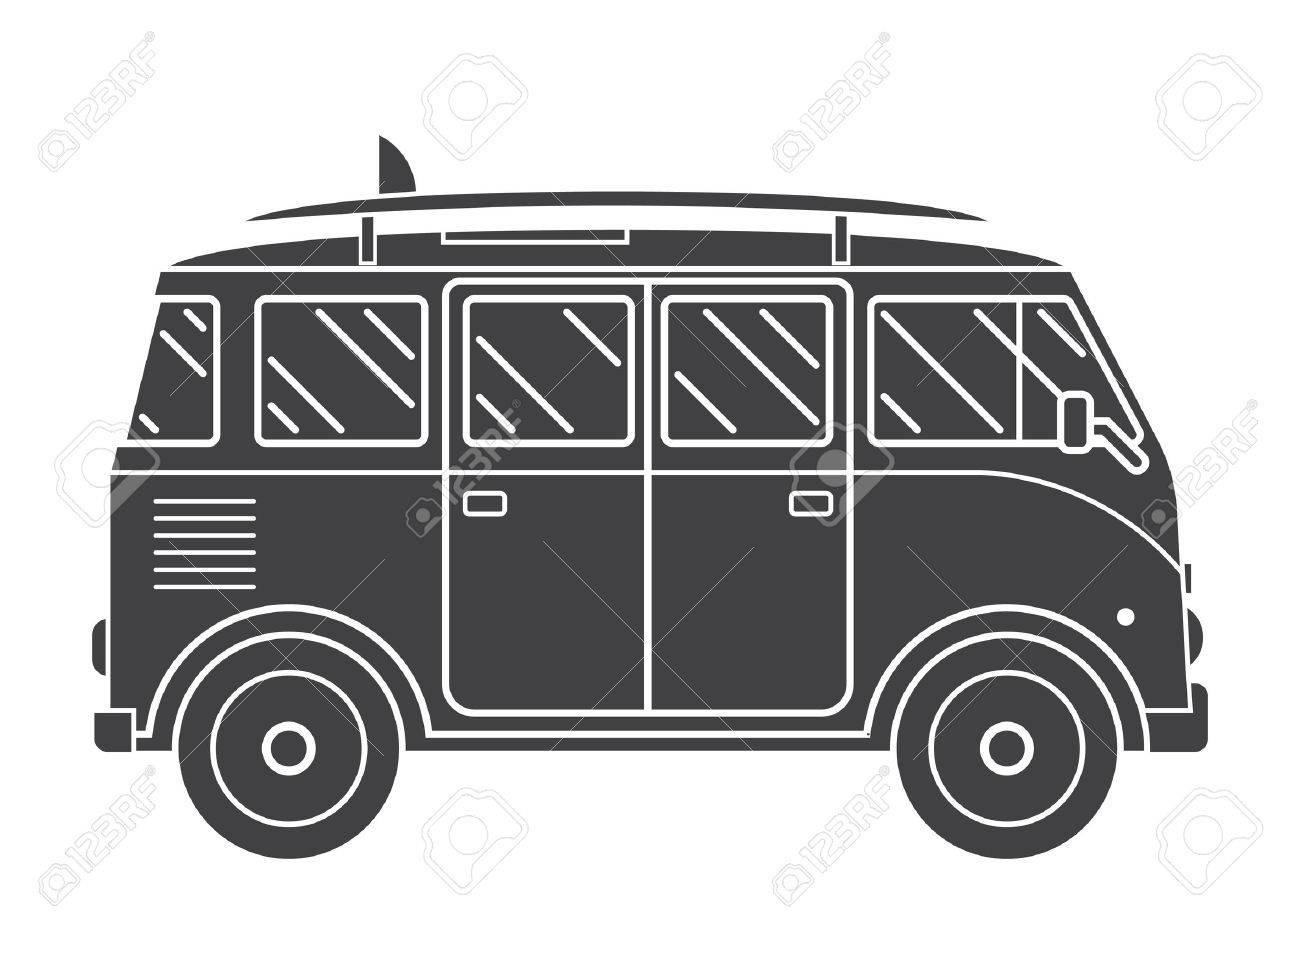 Travel Omnibus Family Camper Silhouette Traveler Truck Tourist Bus Outline Vector Icon RV